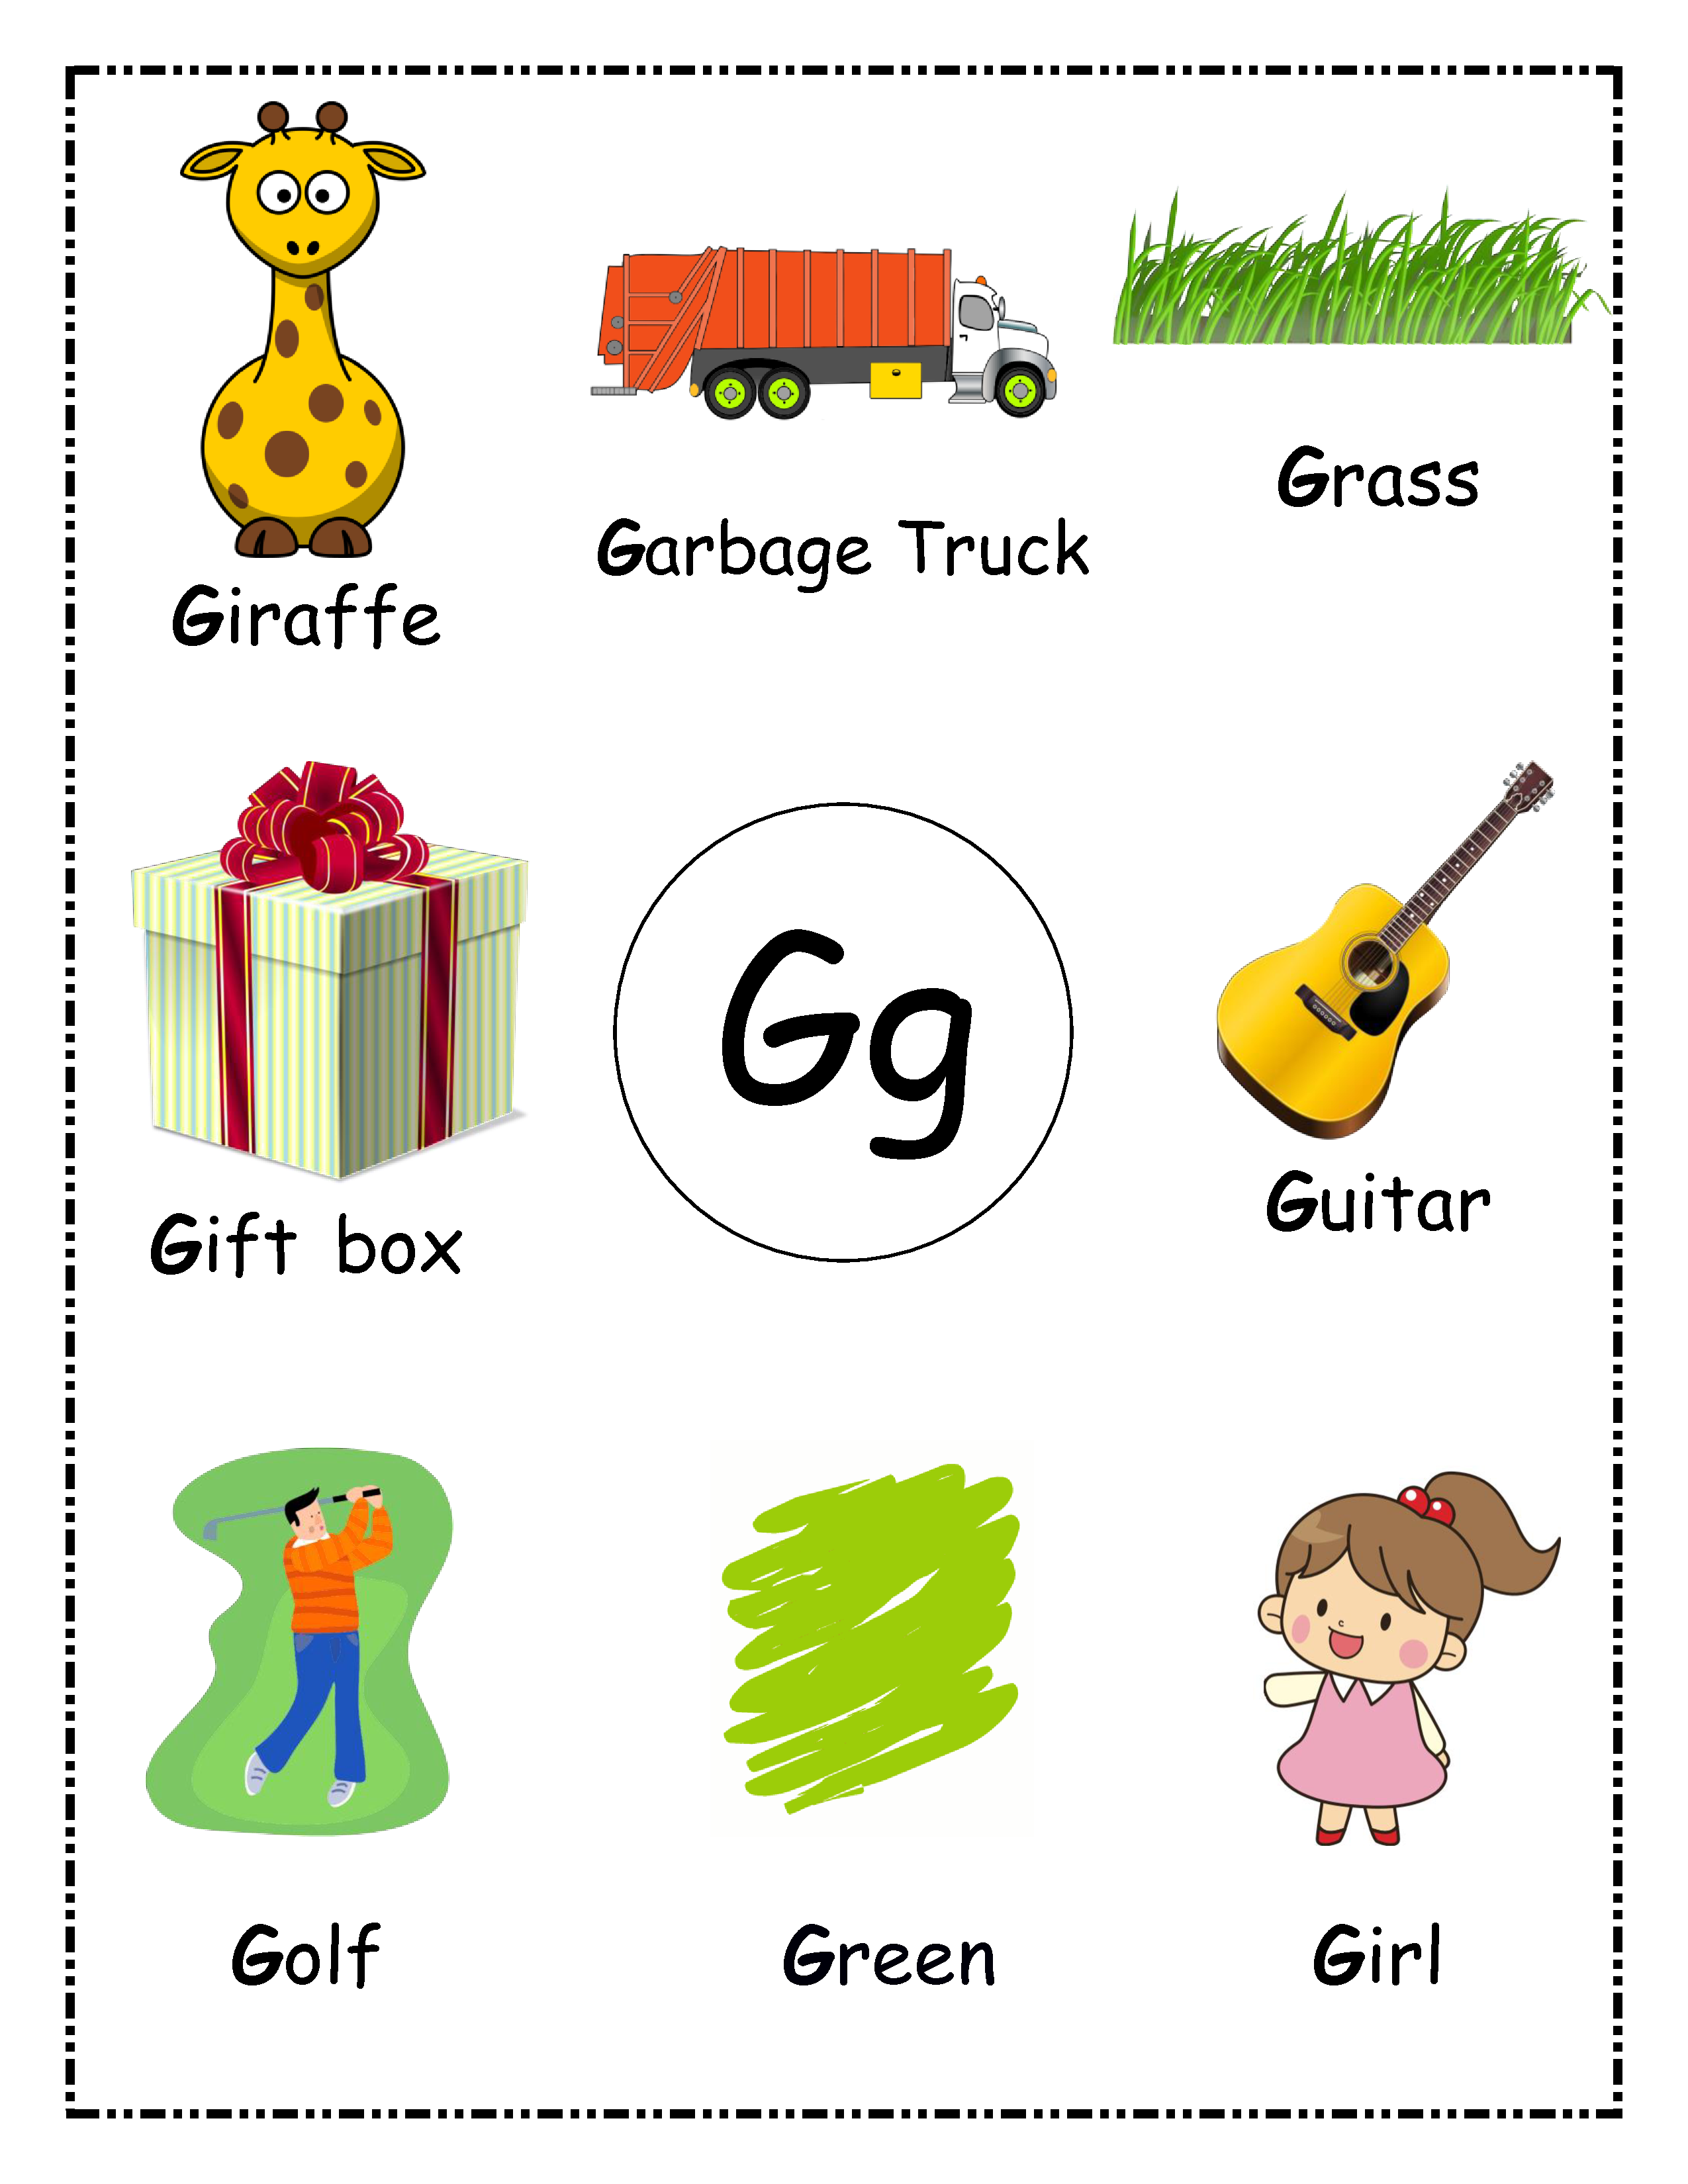 Toddler First Alphabet Picture Book Alphabet Wall Poster